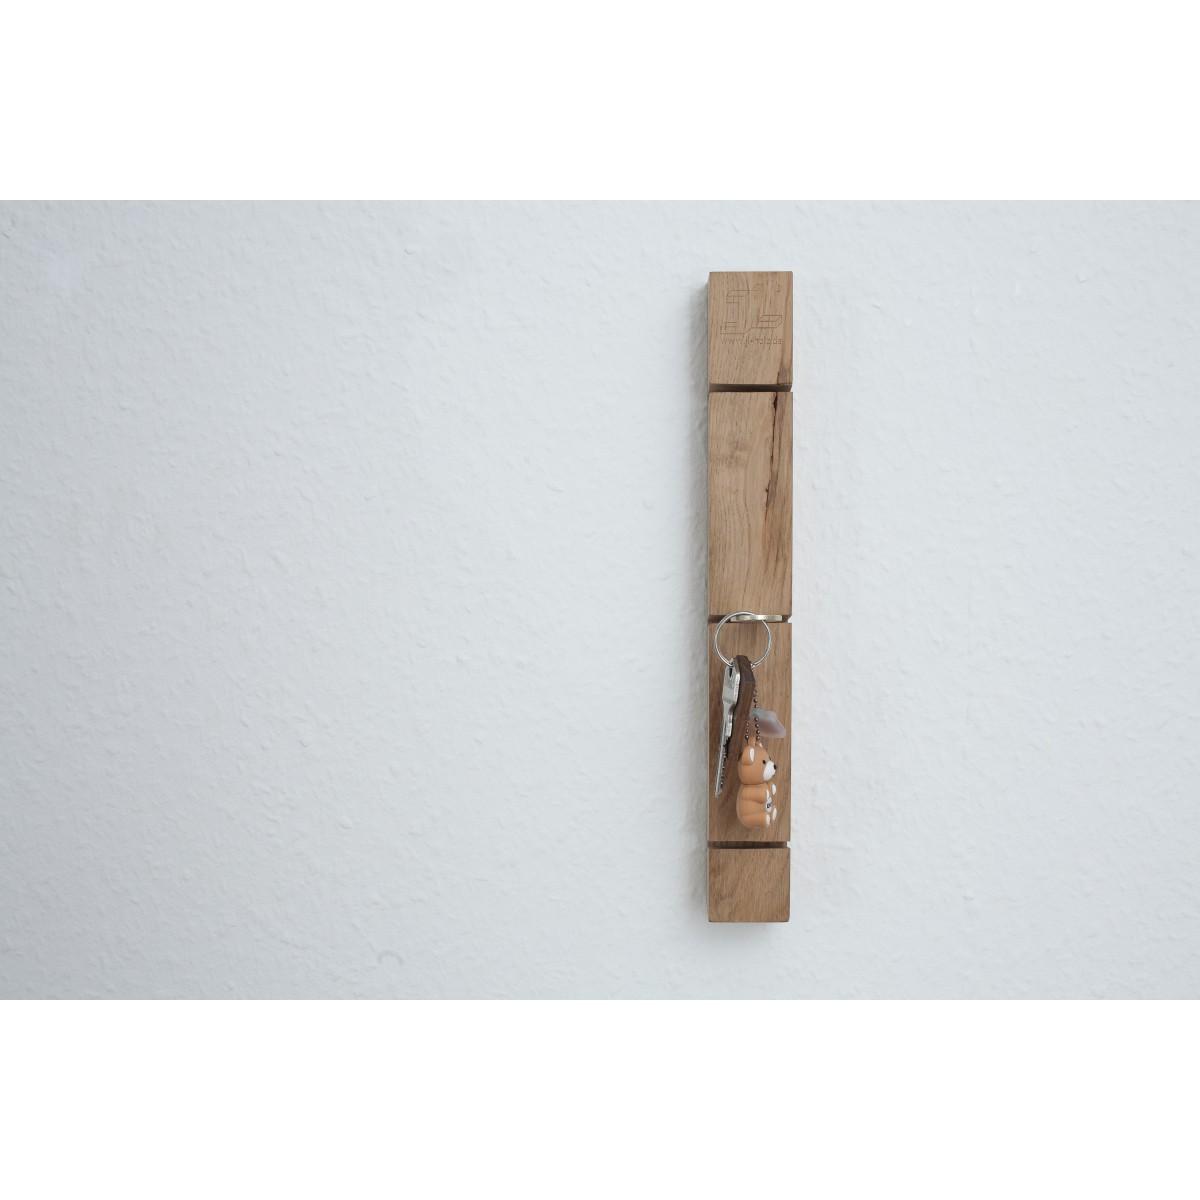 Schlüsselbrett Eiche jl-holz schlüsselbrett (eiche vollmassiv) | selekkt